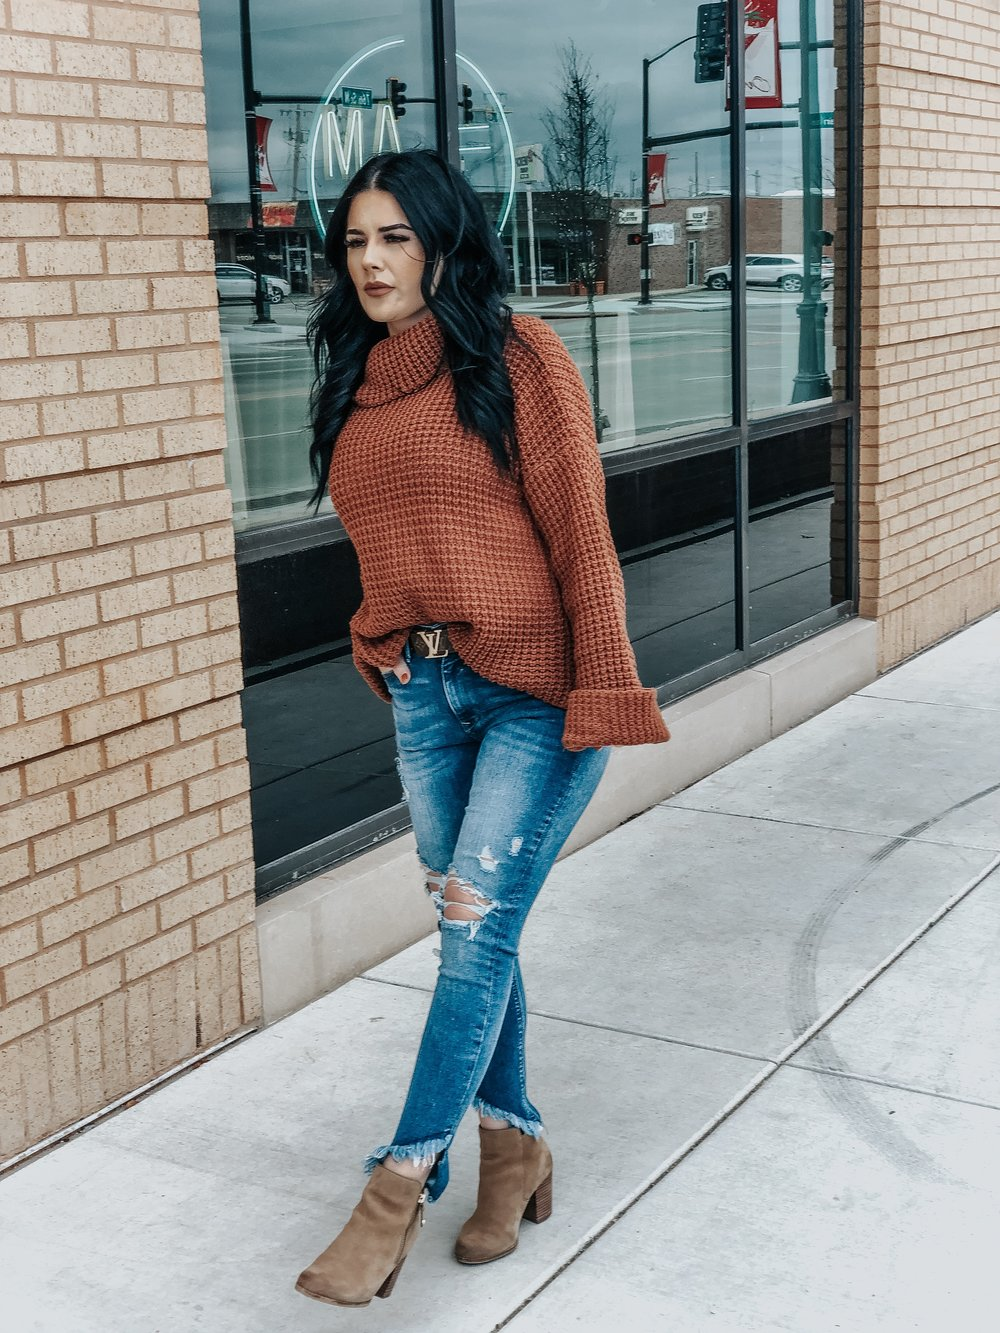 Running In Stilettos Blog - Sweater Season